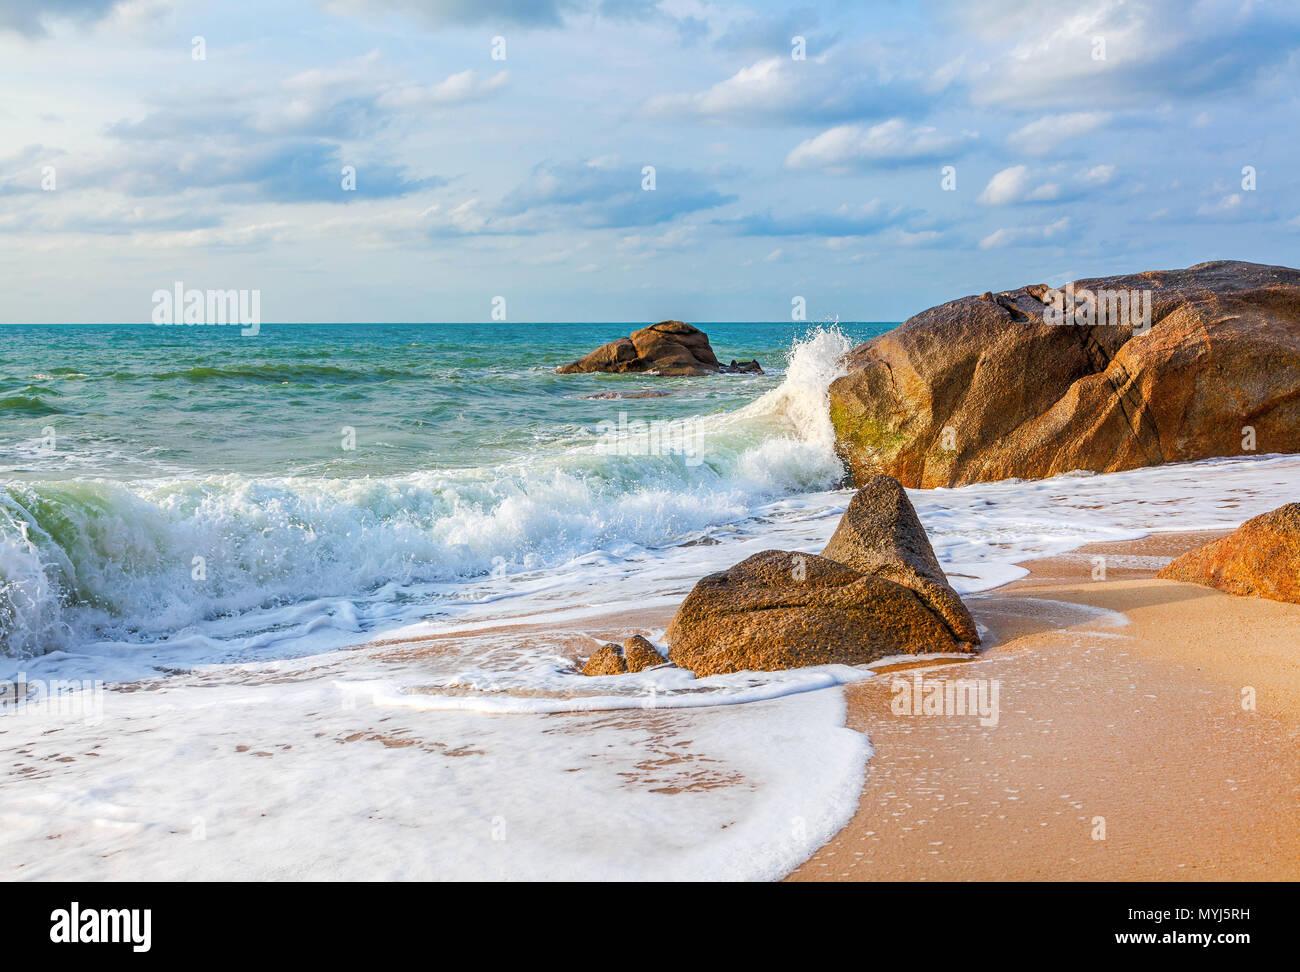 Morning on Lamai beach. Koh Samui. Thailand. - Stock Image